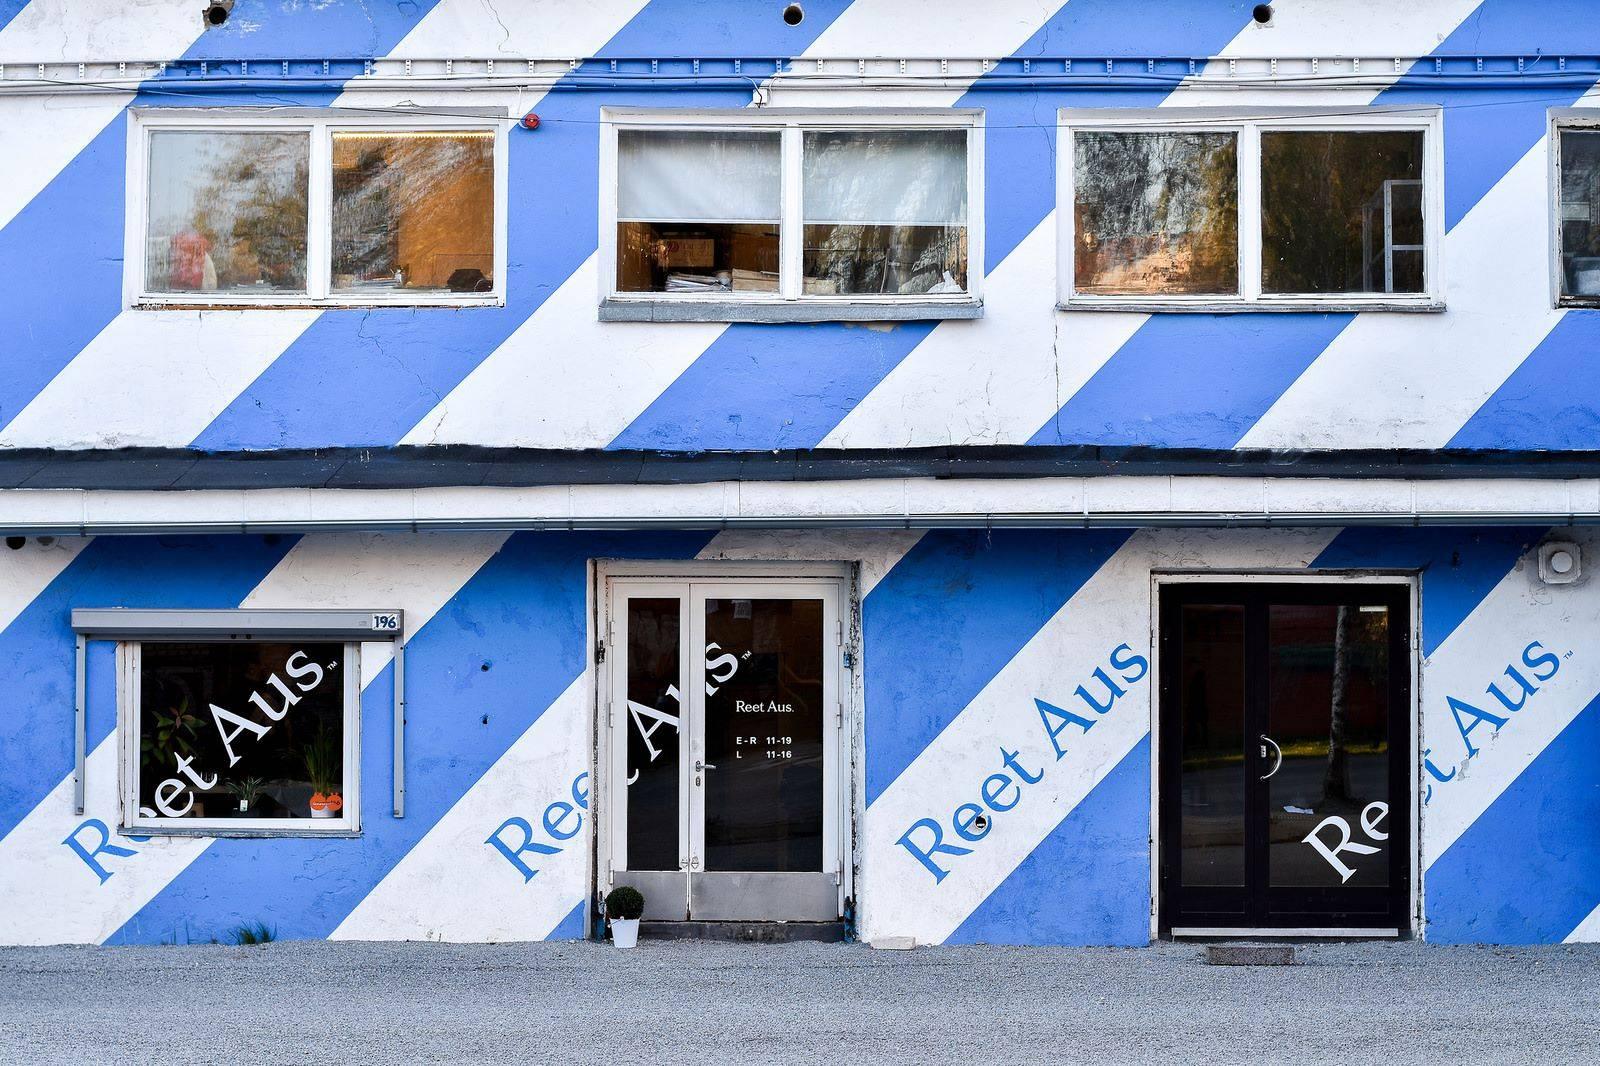 Reet Aus Studio Shop